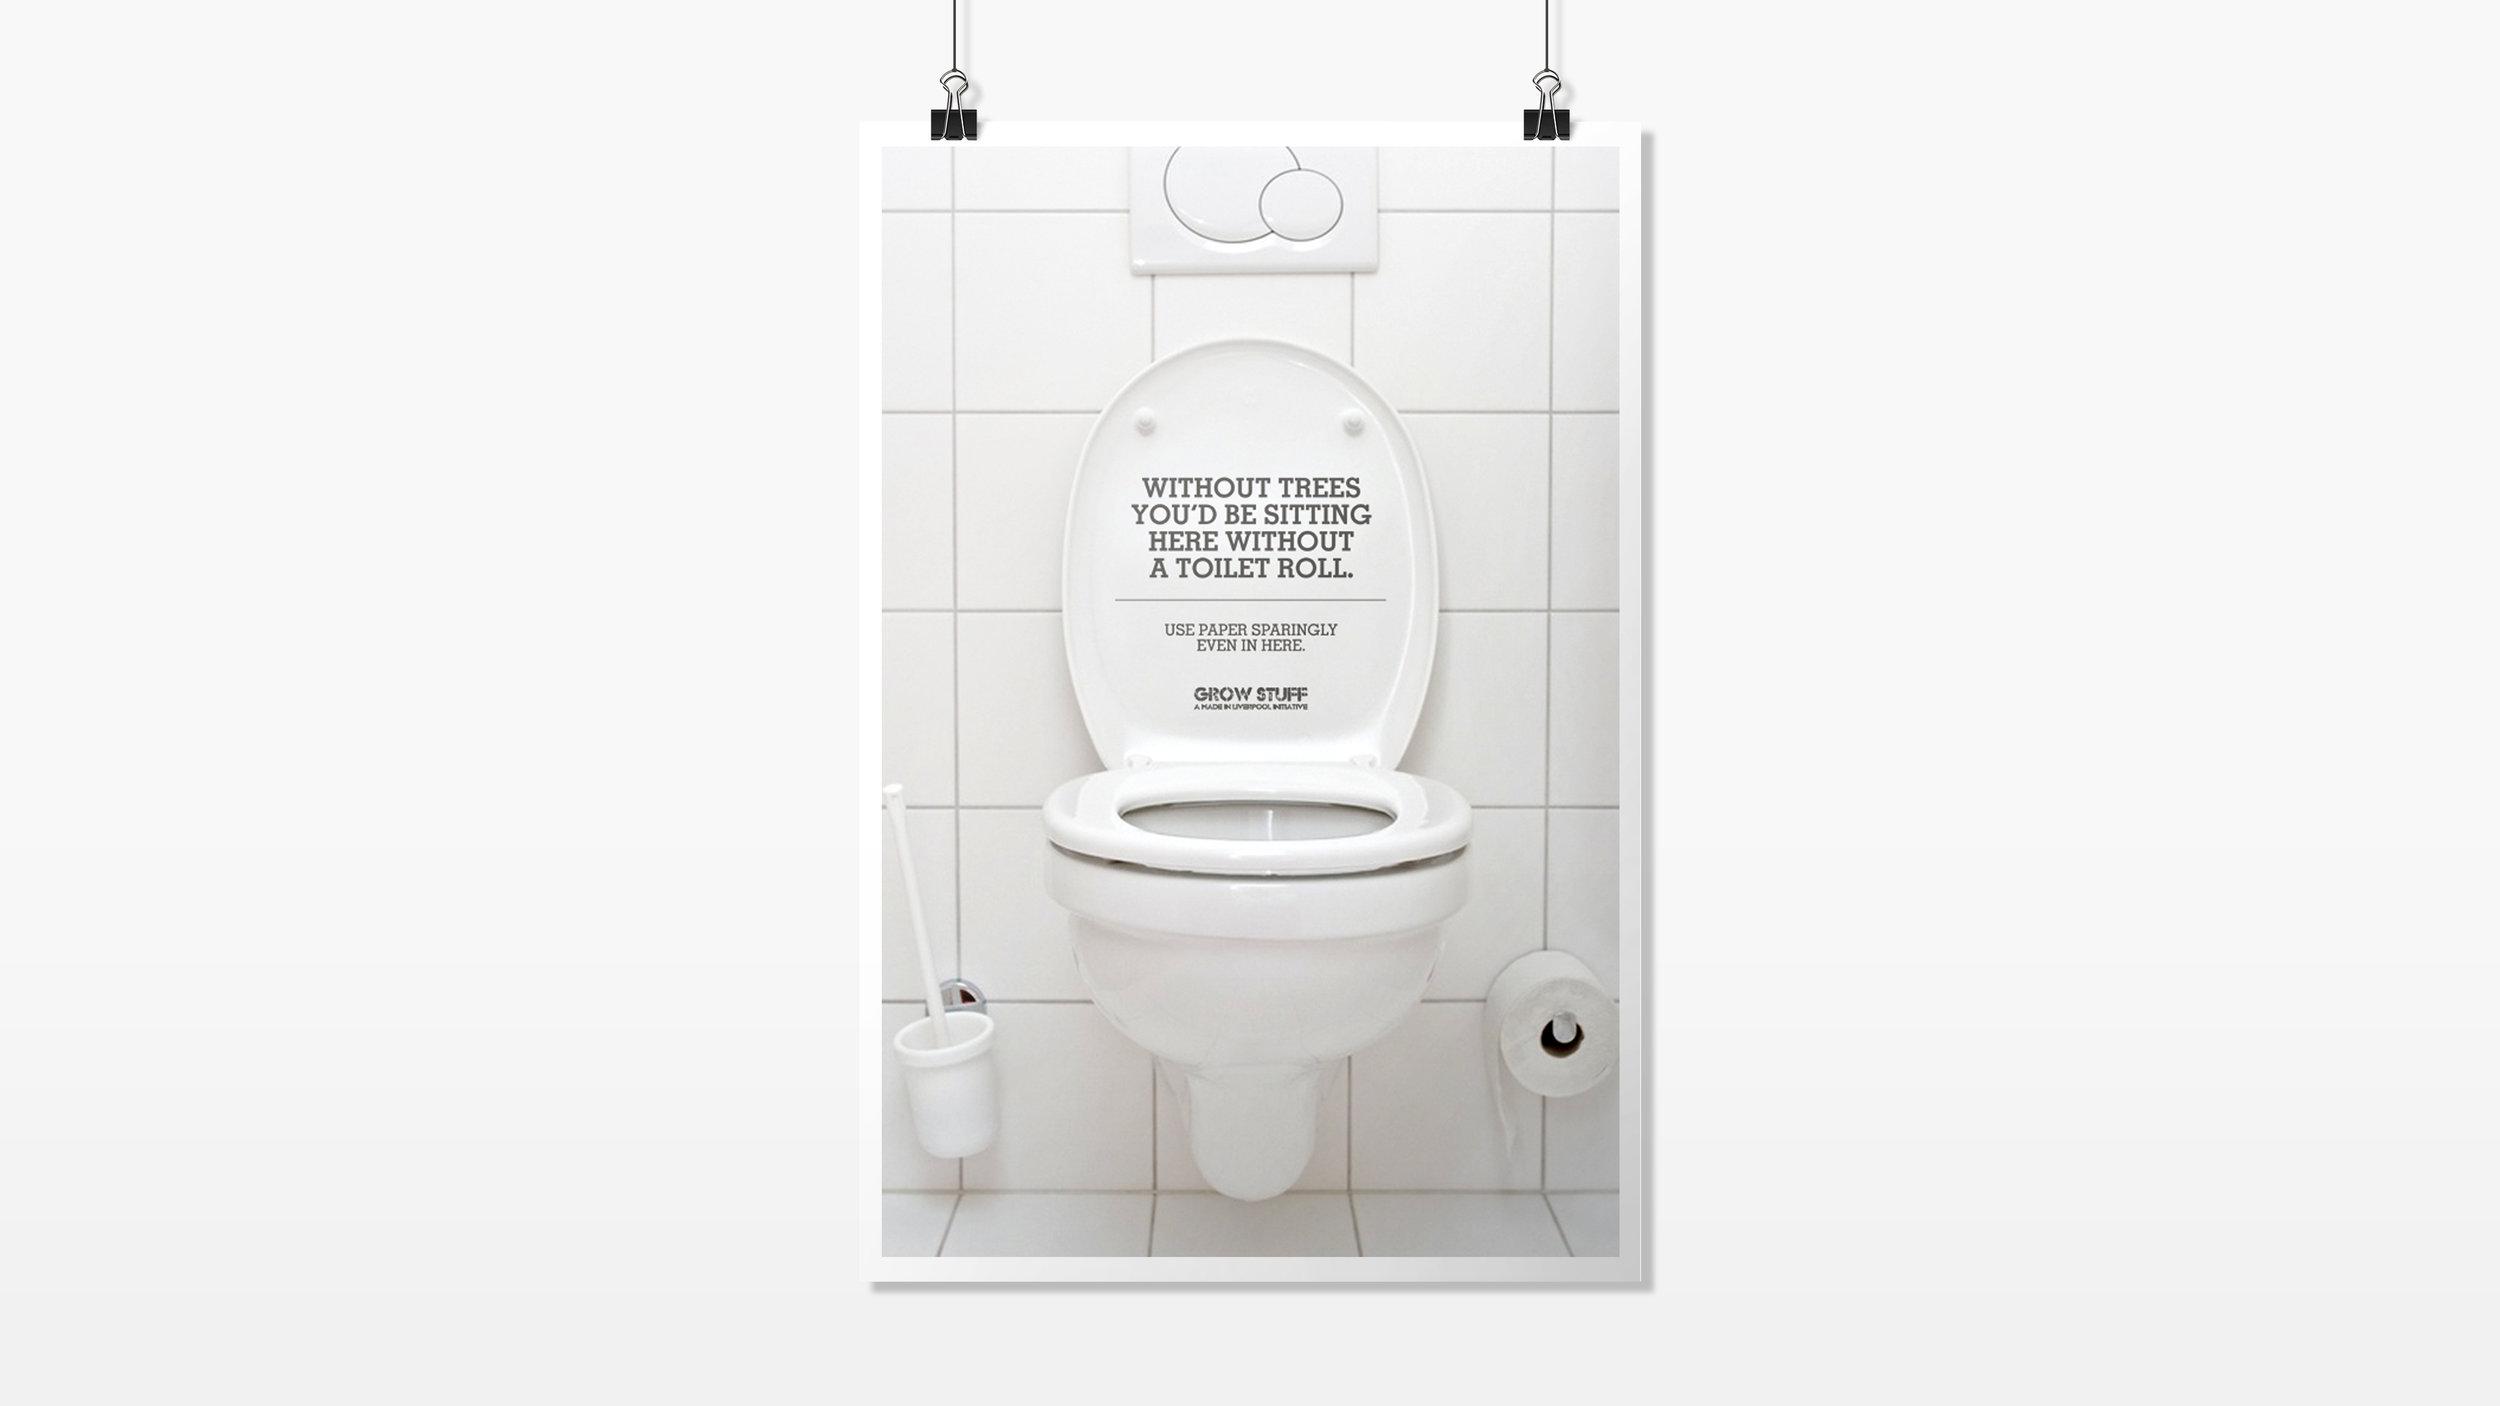 Brand_republica_Made_In_Liverpool_eco_bathroom_campaign_00.jpg